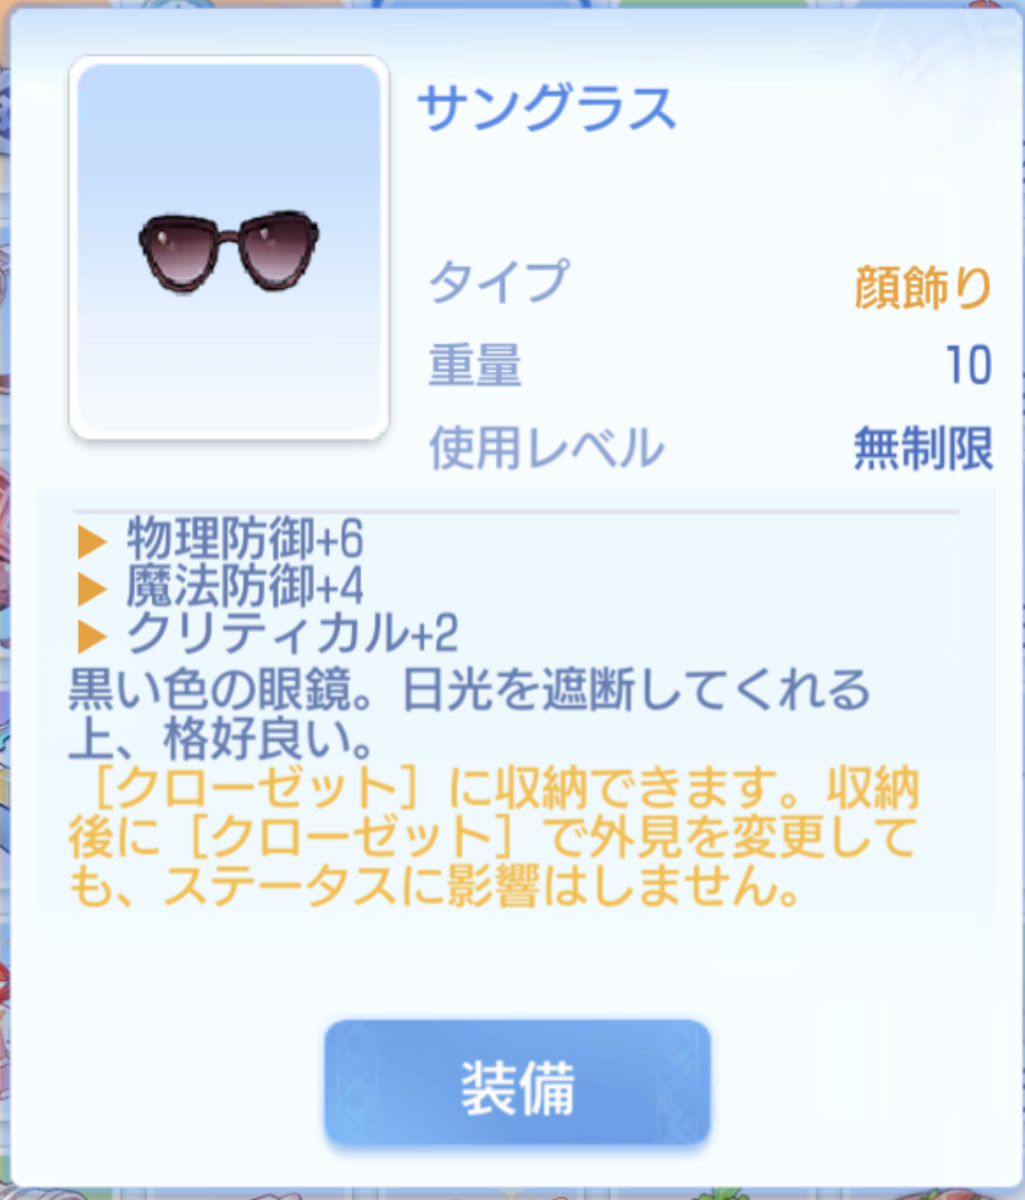 f:id:yamada_ragnarok:20210803100247p:plain